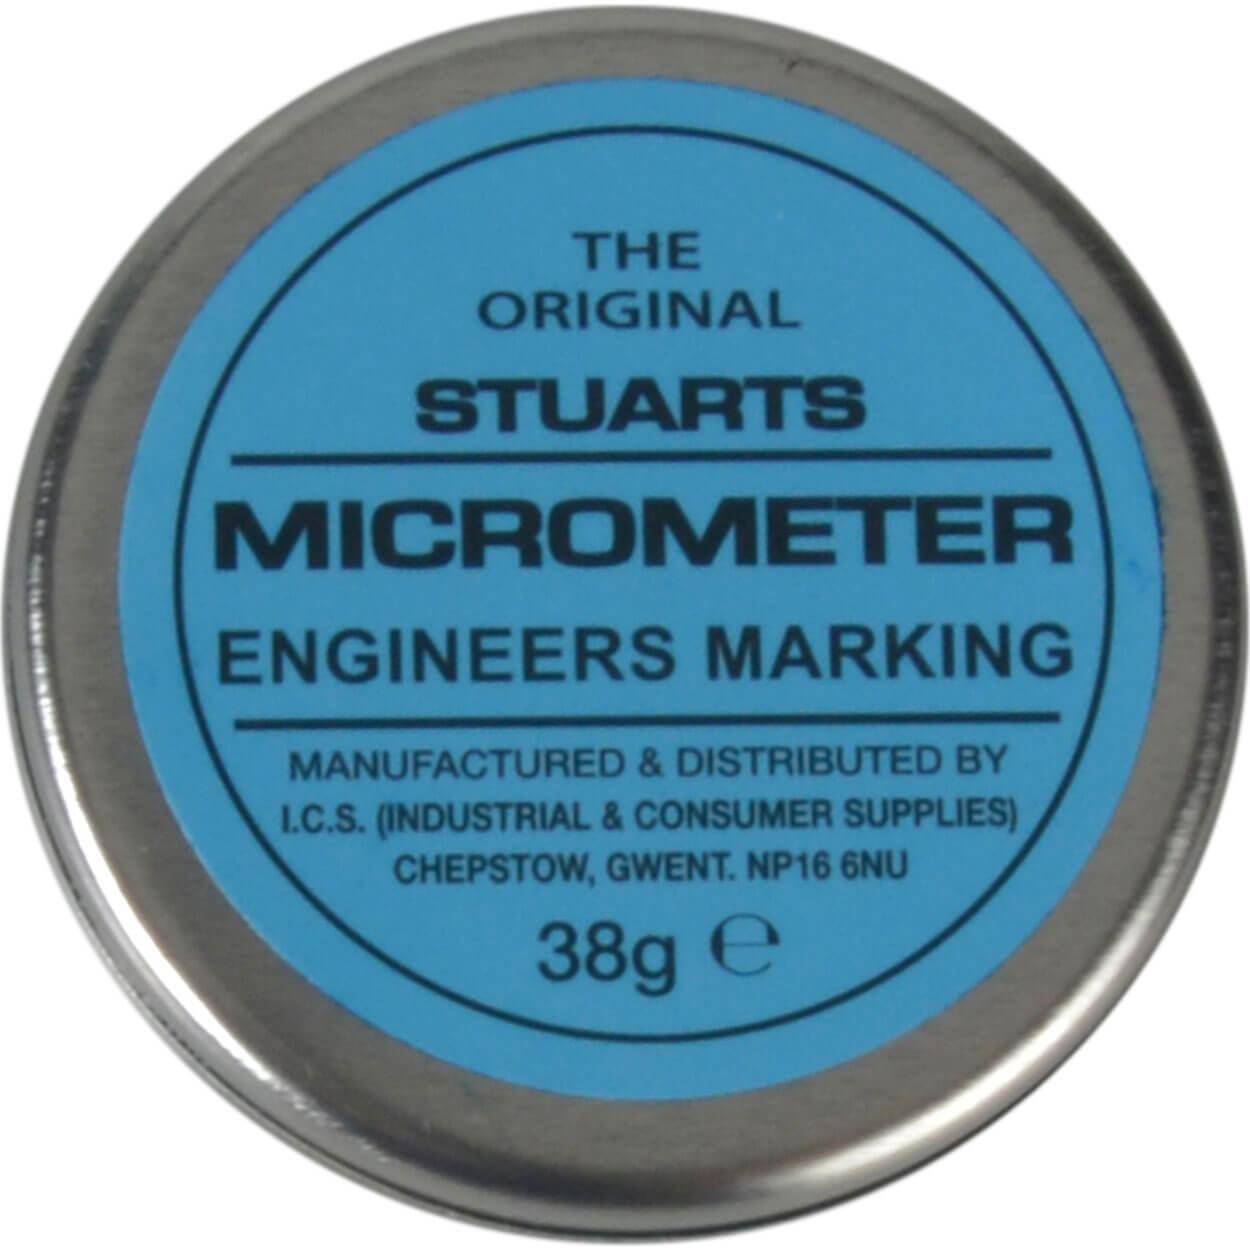 Image of Stuarts Original Micrometer Engineers Marking Blue